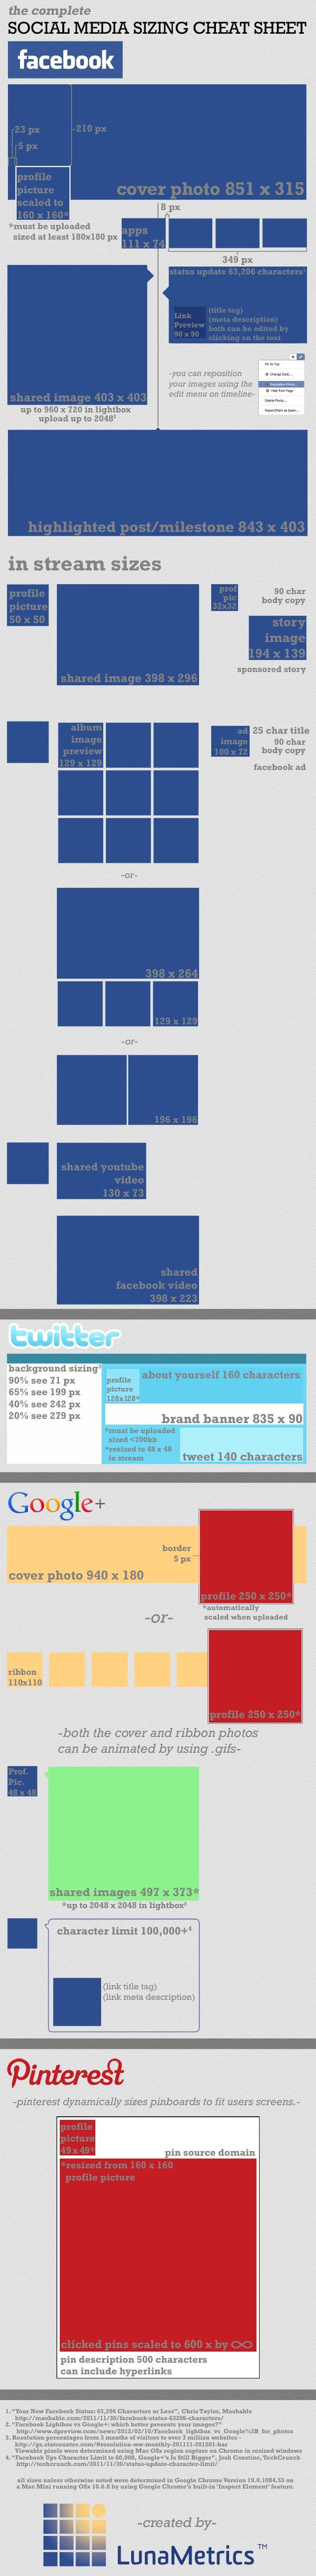 Social Media Cheat Sheet by LunaMetrics